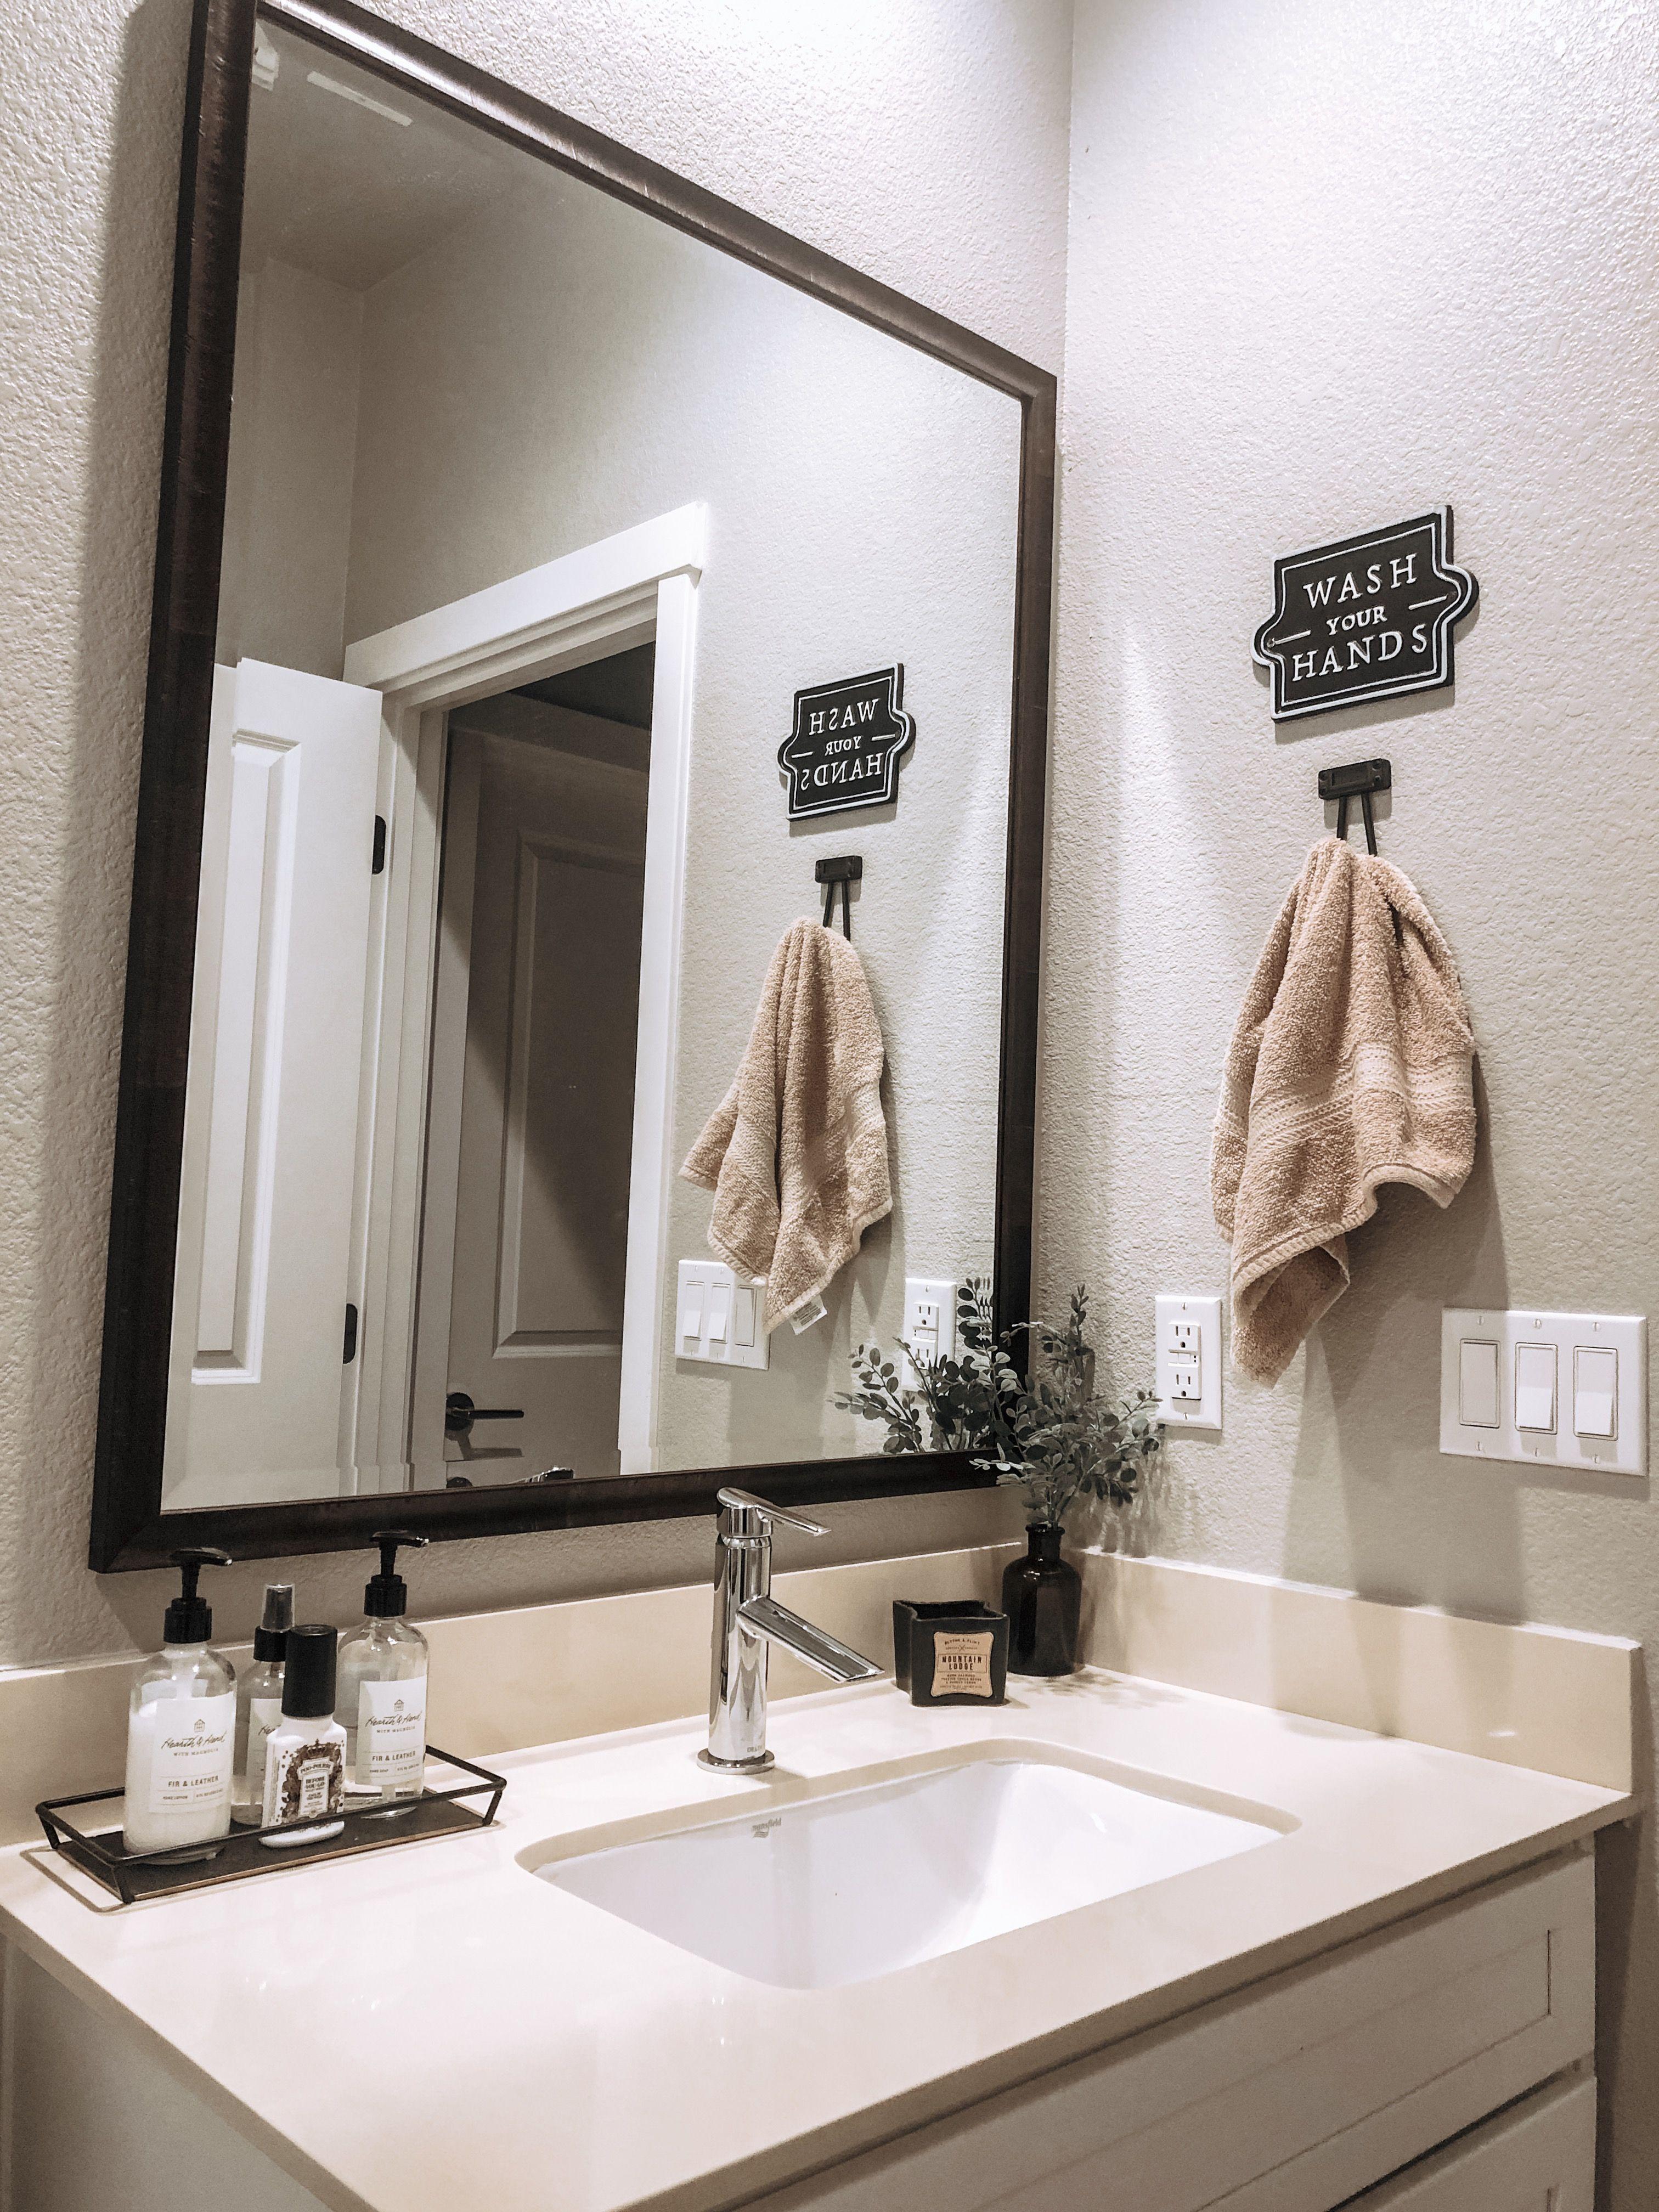 Magnolia Home Bathroom  Industrial bathroom decor, Bathroom decor